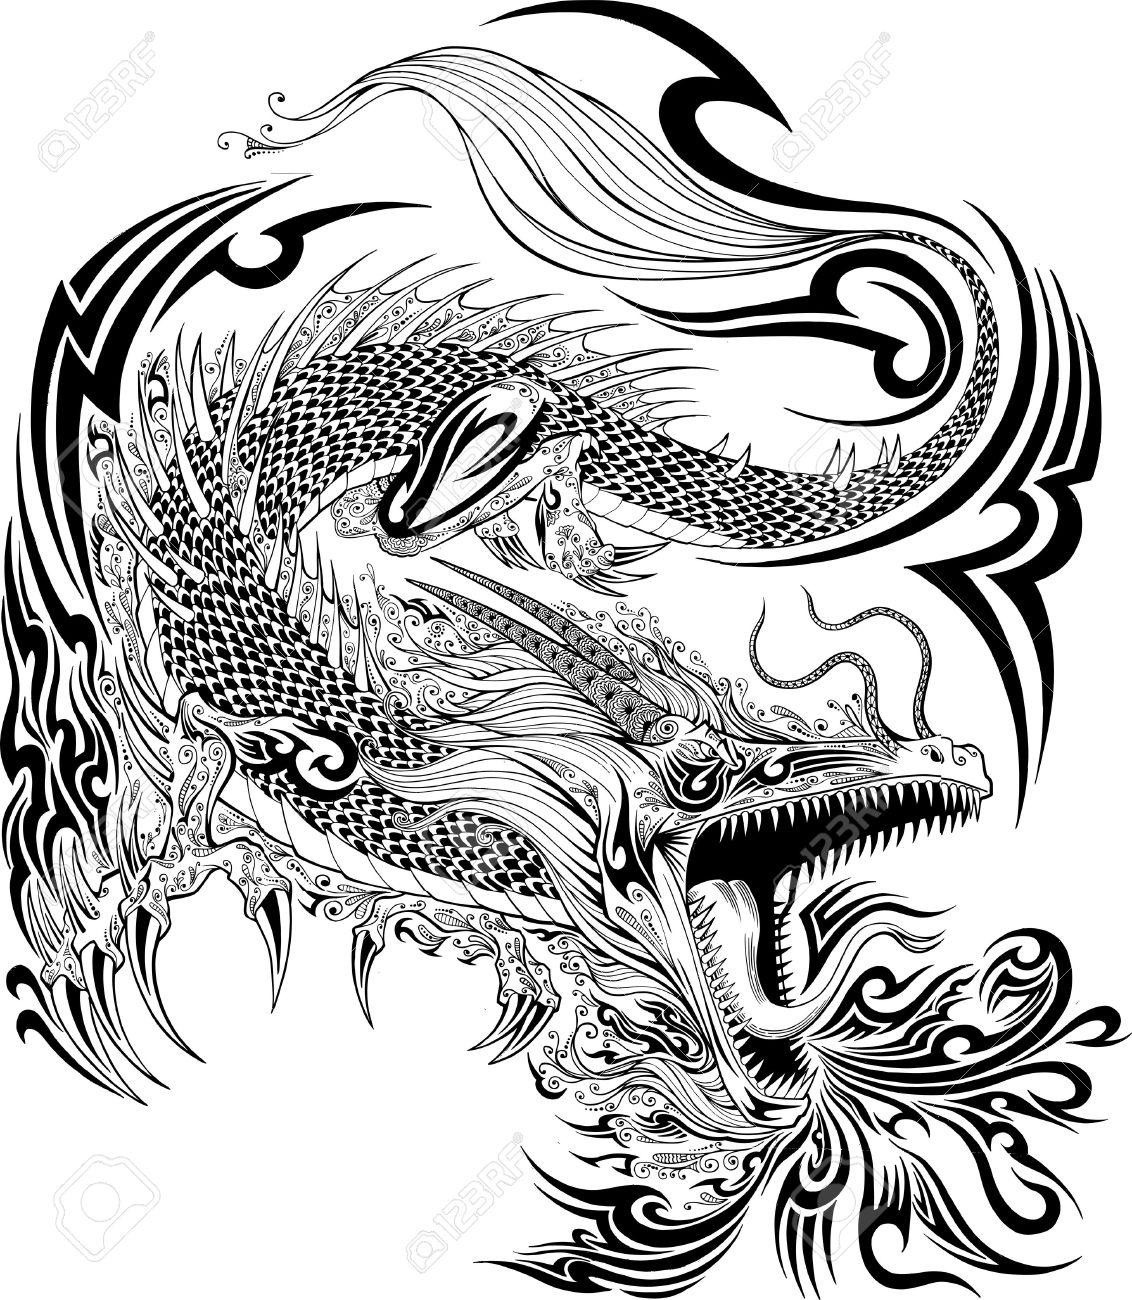 Dragon Doodle Sketch Tattoo Vector - 31454729